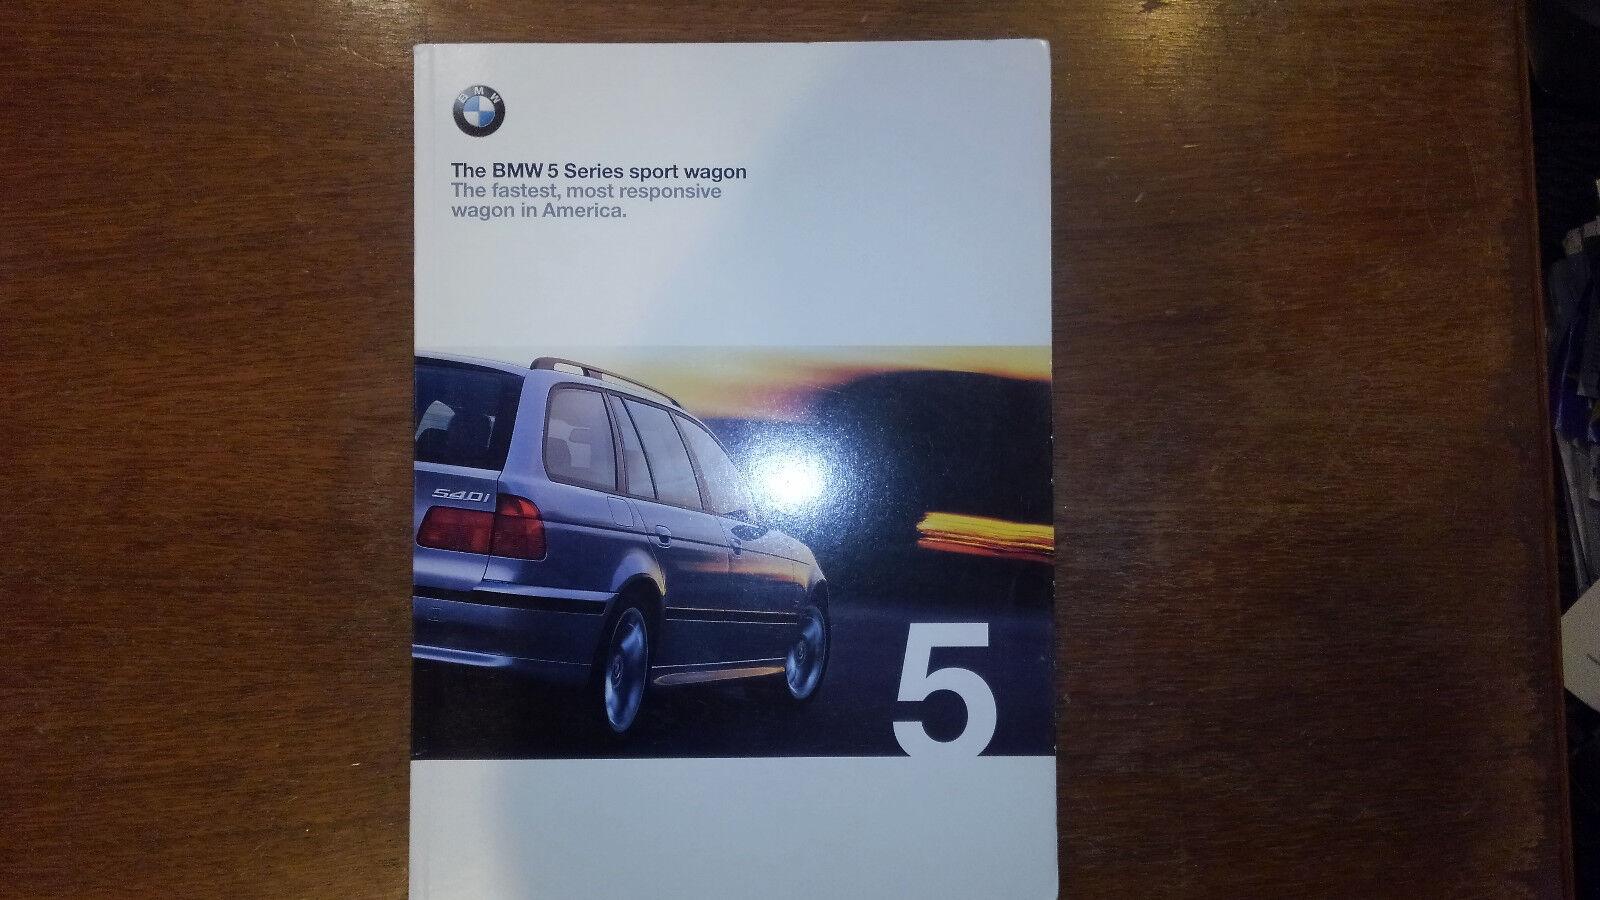 1999 BMW 528i 540i 5-Series Sport Wagon Brochure + Tech Guide Pamphlet inside